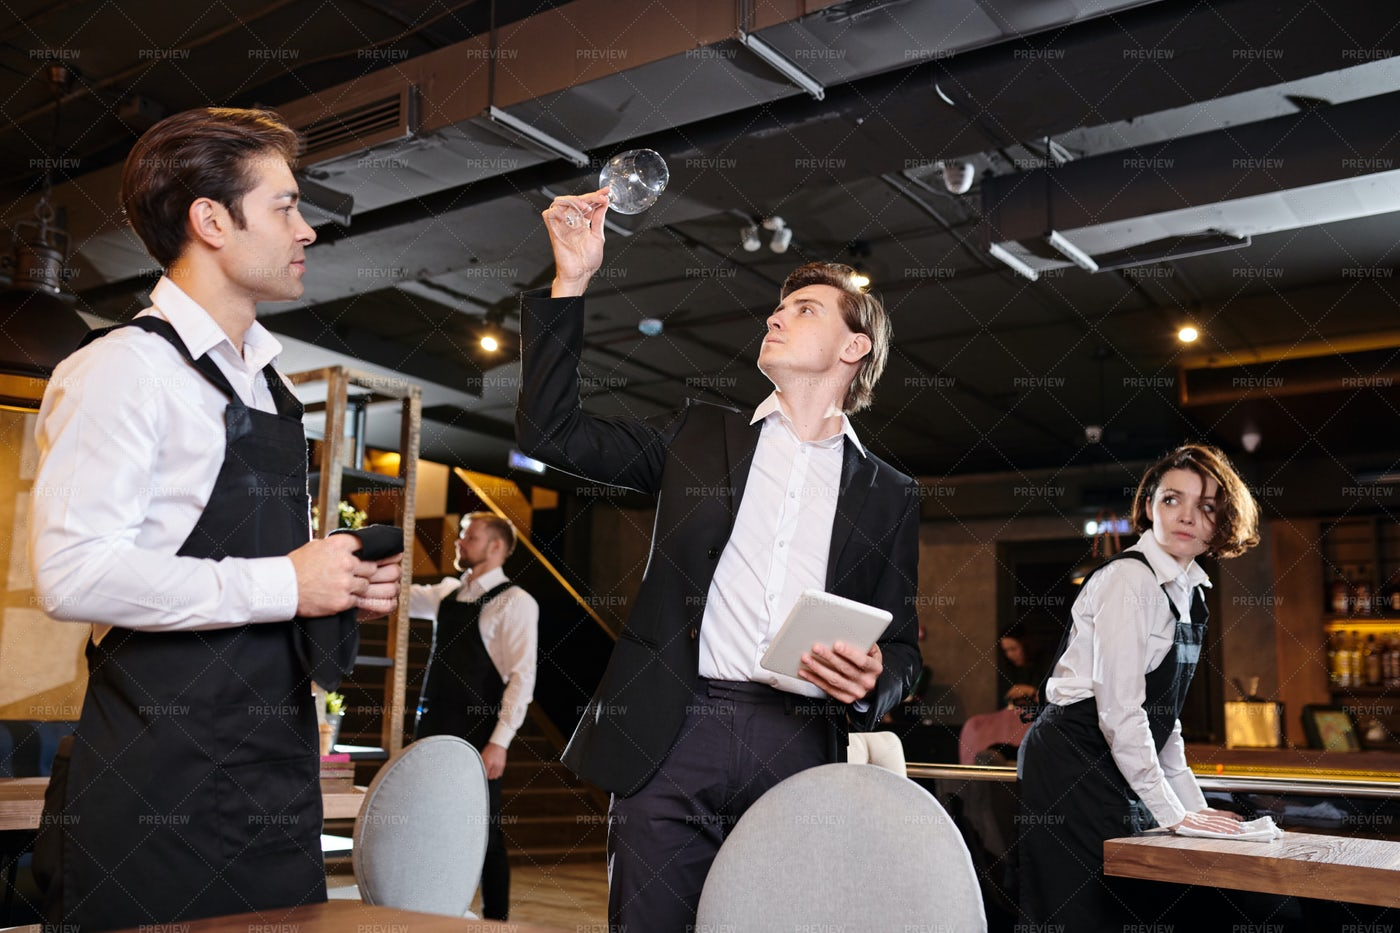 Professional Restaurateur Checking...: Stock Photos